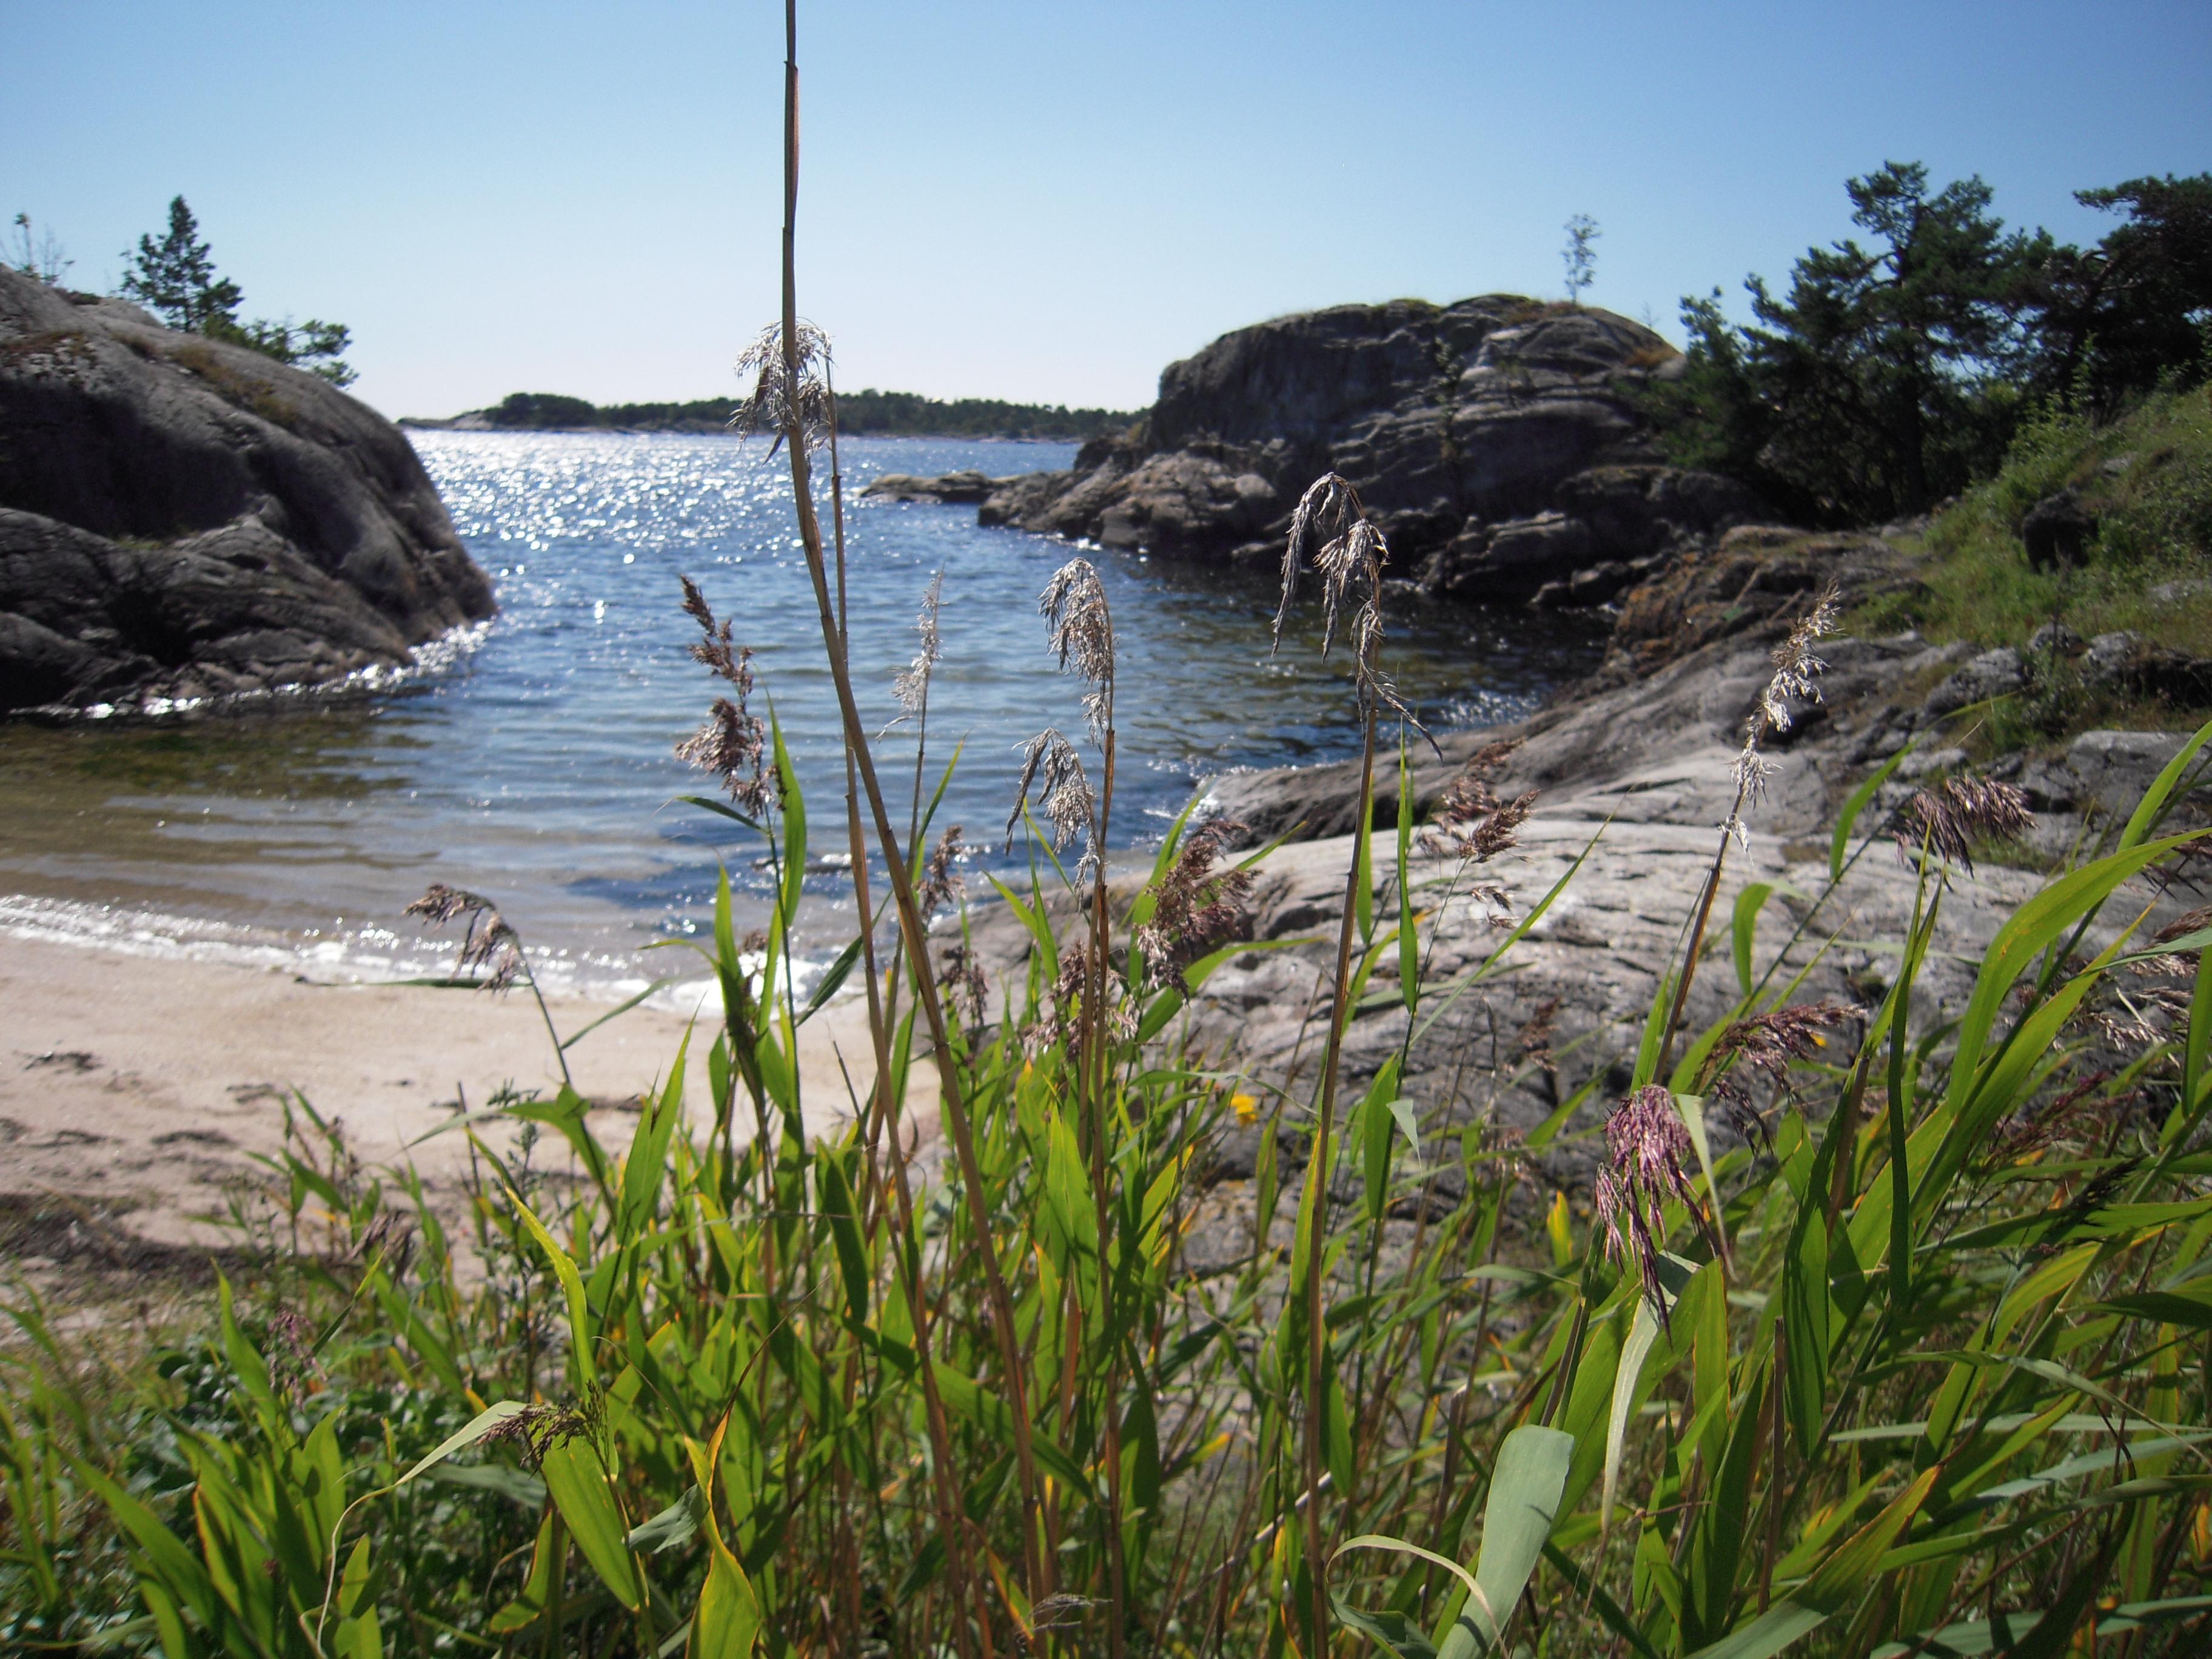 Ivarsand, en flott strand som ligger langs kyststien, © Steinar Skilhagen